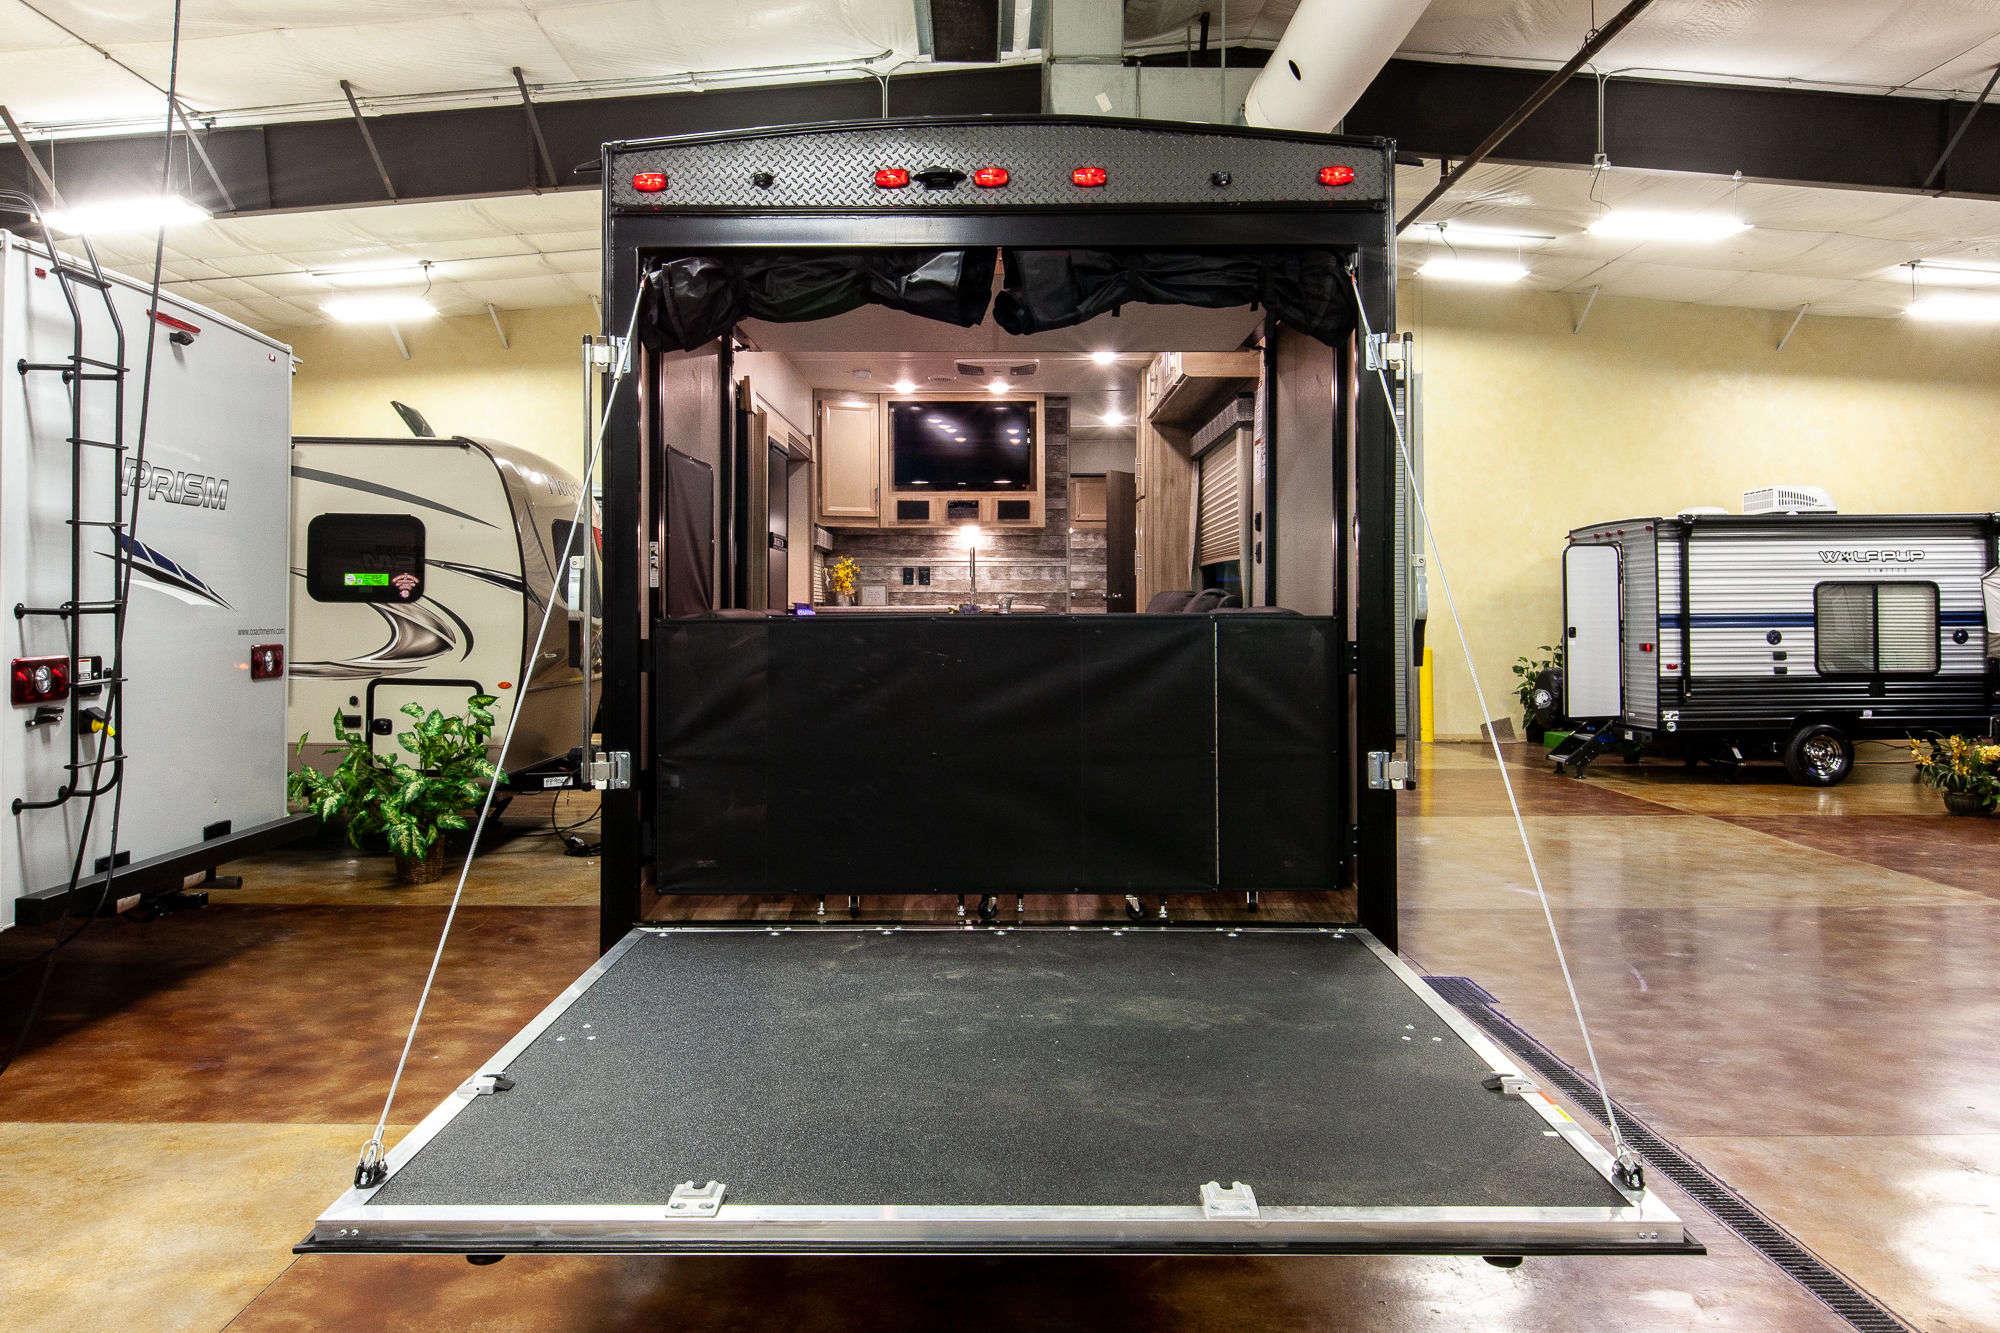 2021 Coachmen Catalina Trail Blazer 28THS Bunkhouse Toy Hauler Travel Trailer Exterior Image